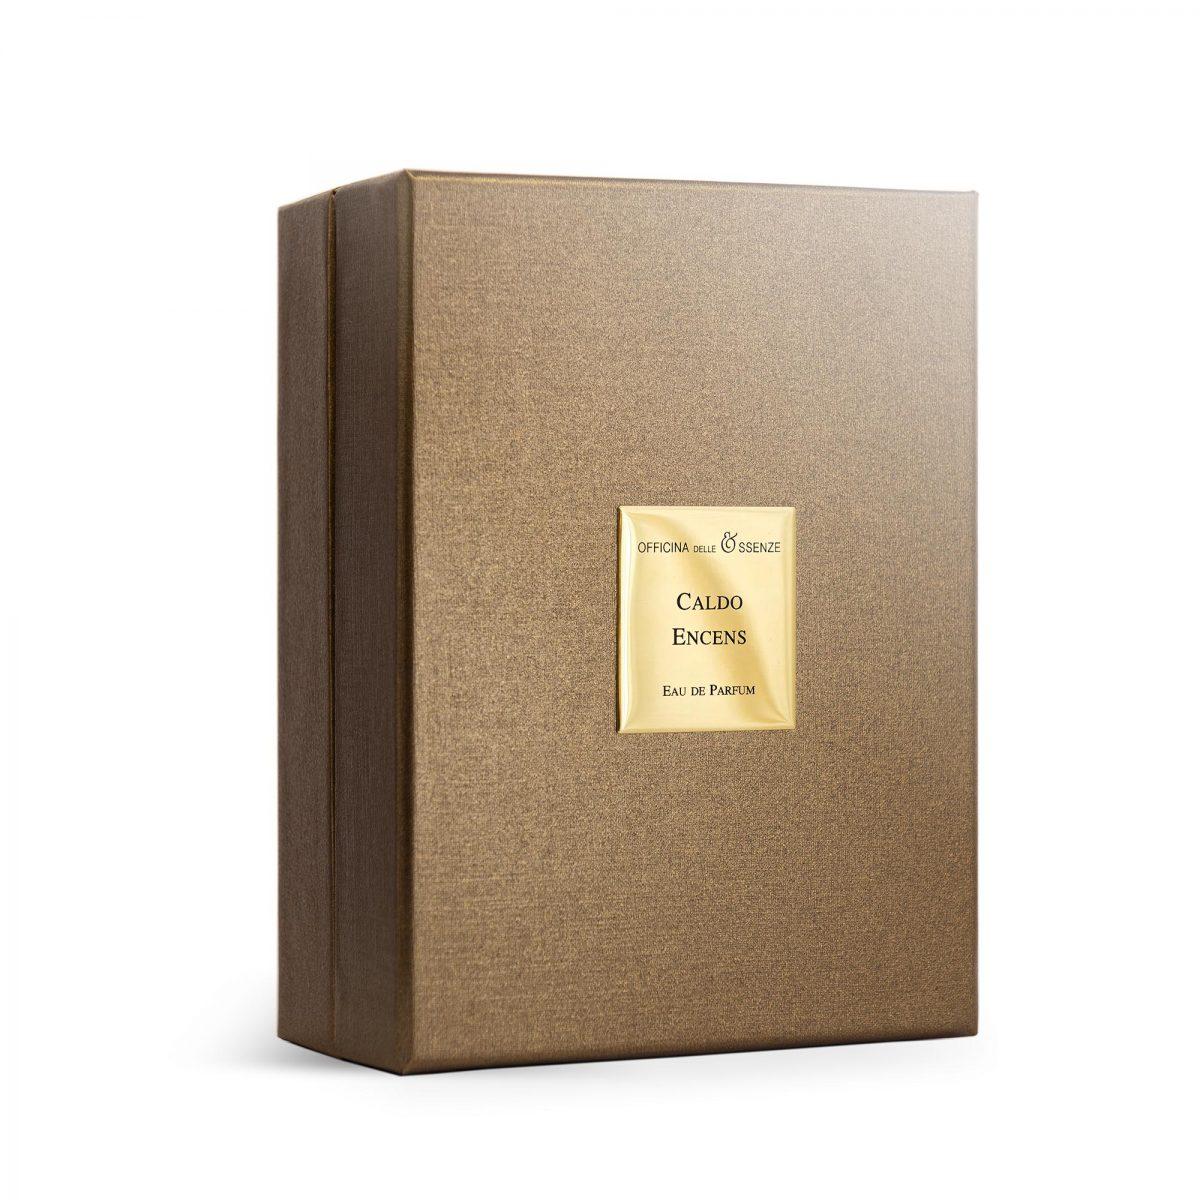 Officina delle Essenze box Caldo Encens